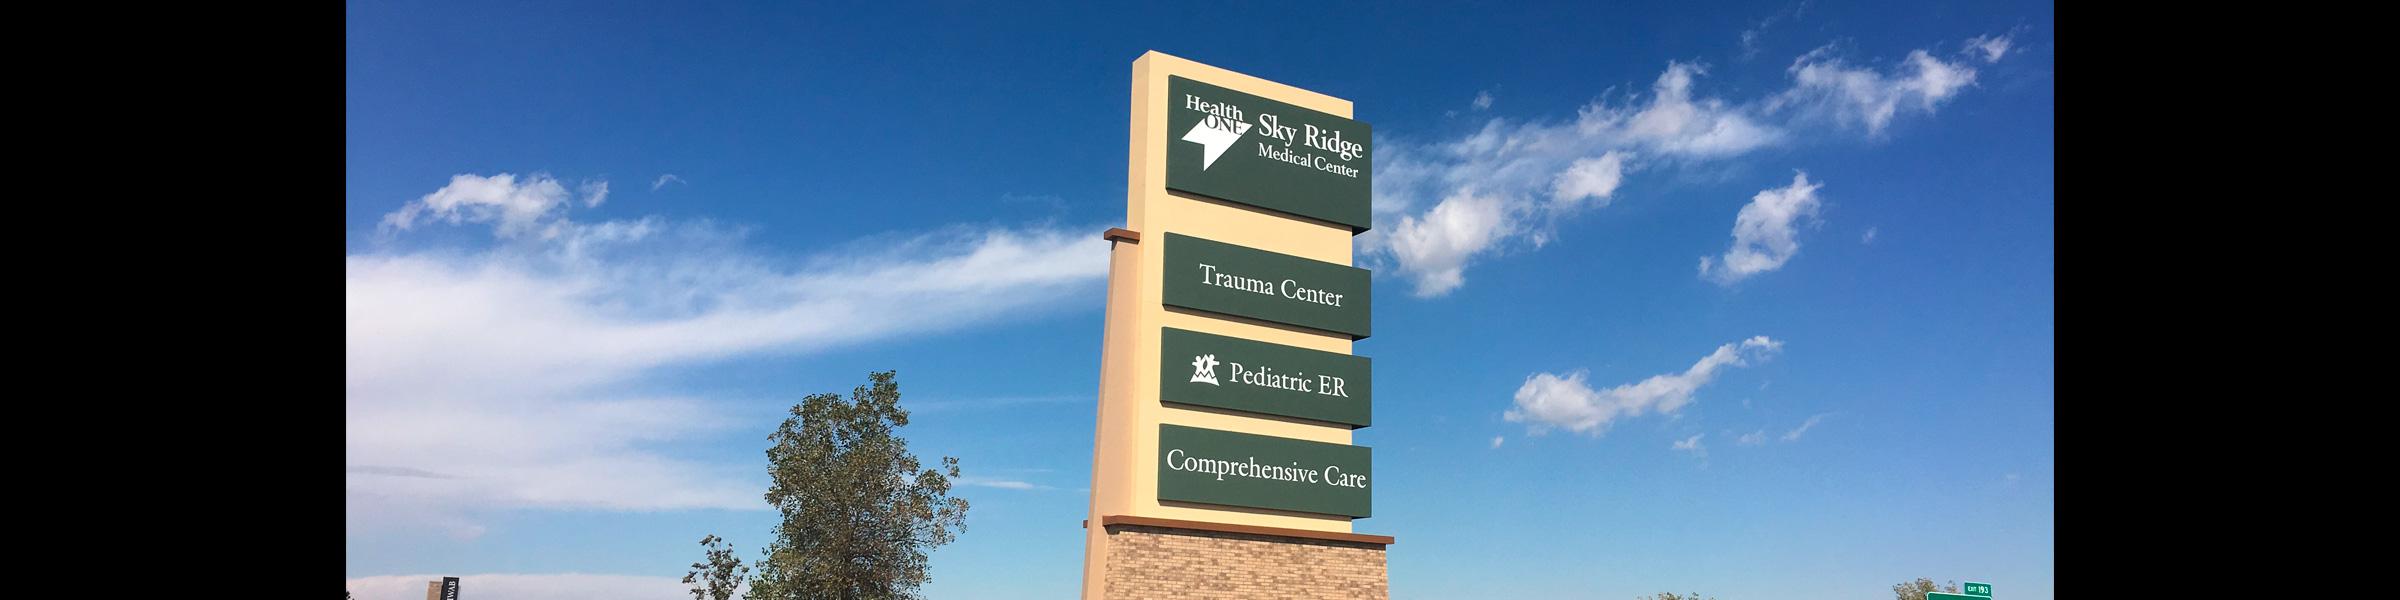 Hospital Facility-Wide Signage